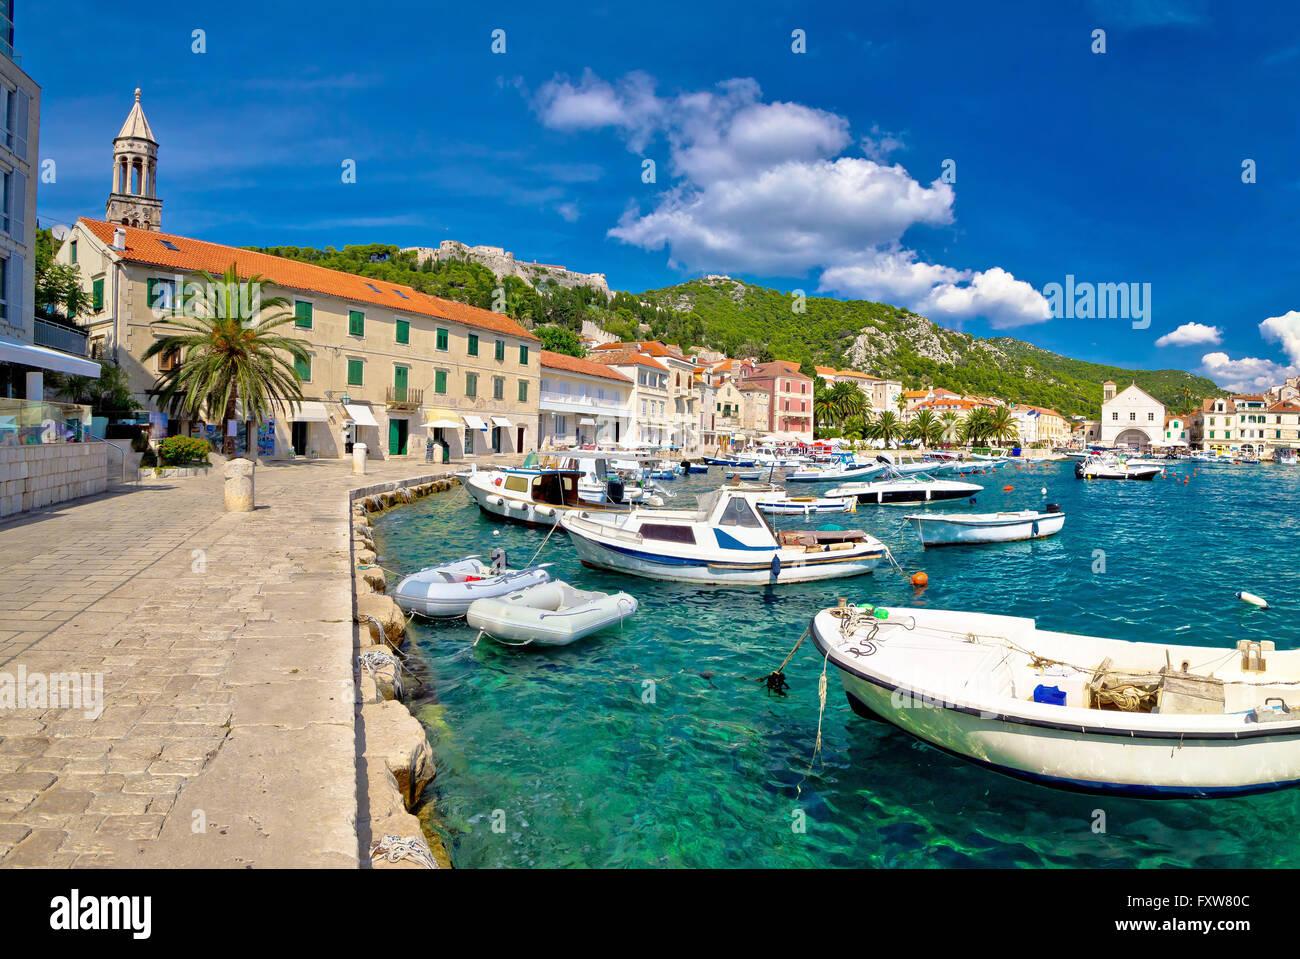 Scenic coast of town Hvar, Dalmatia, Croatia - Stock Image